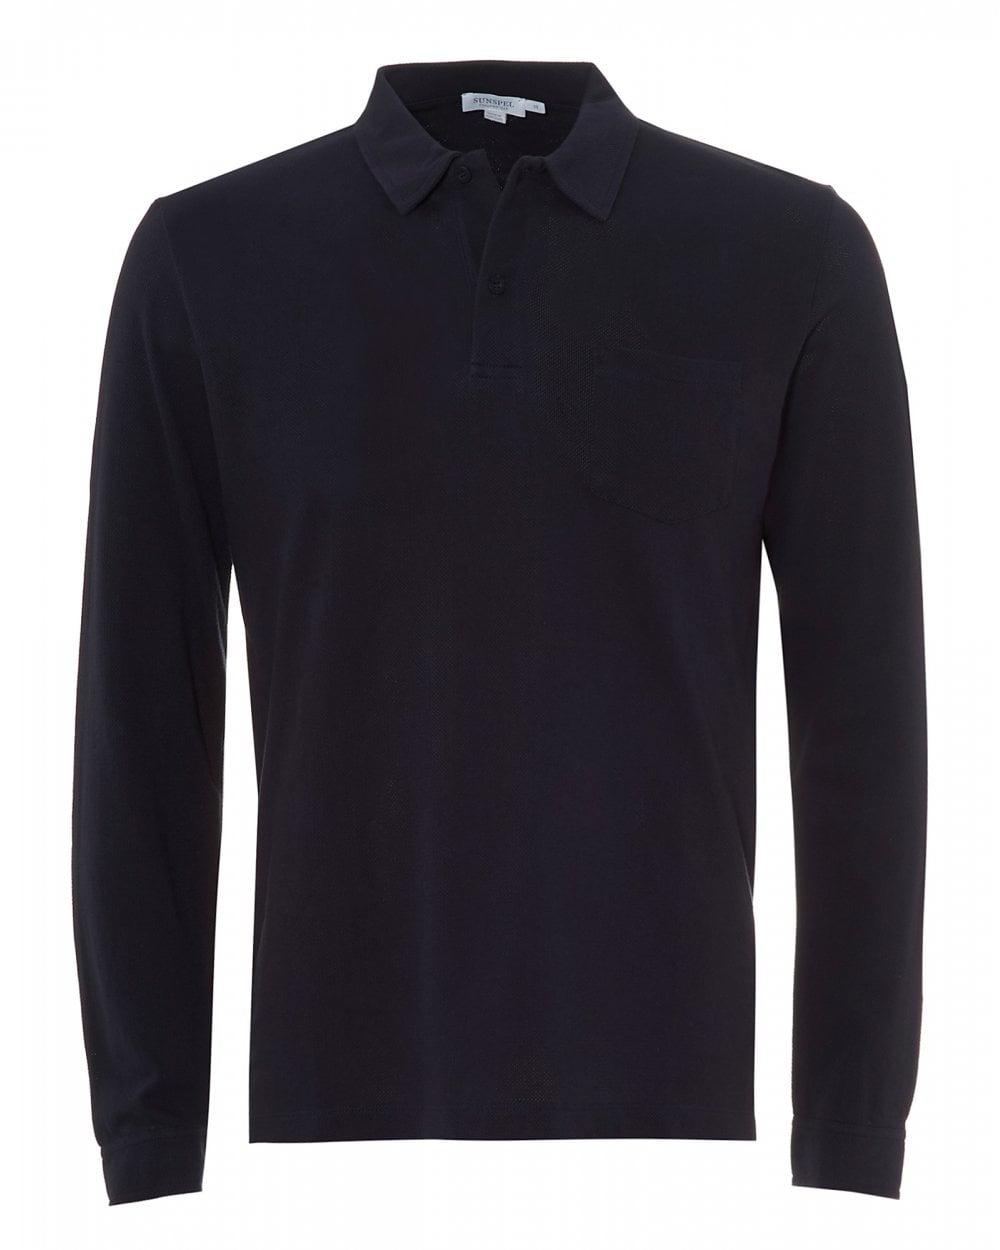 6736f9f8ab9 Sunspel Mens Cotton Riviera Polo Shirt